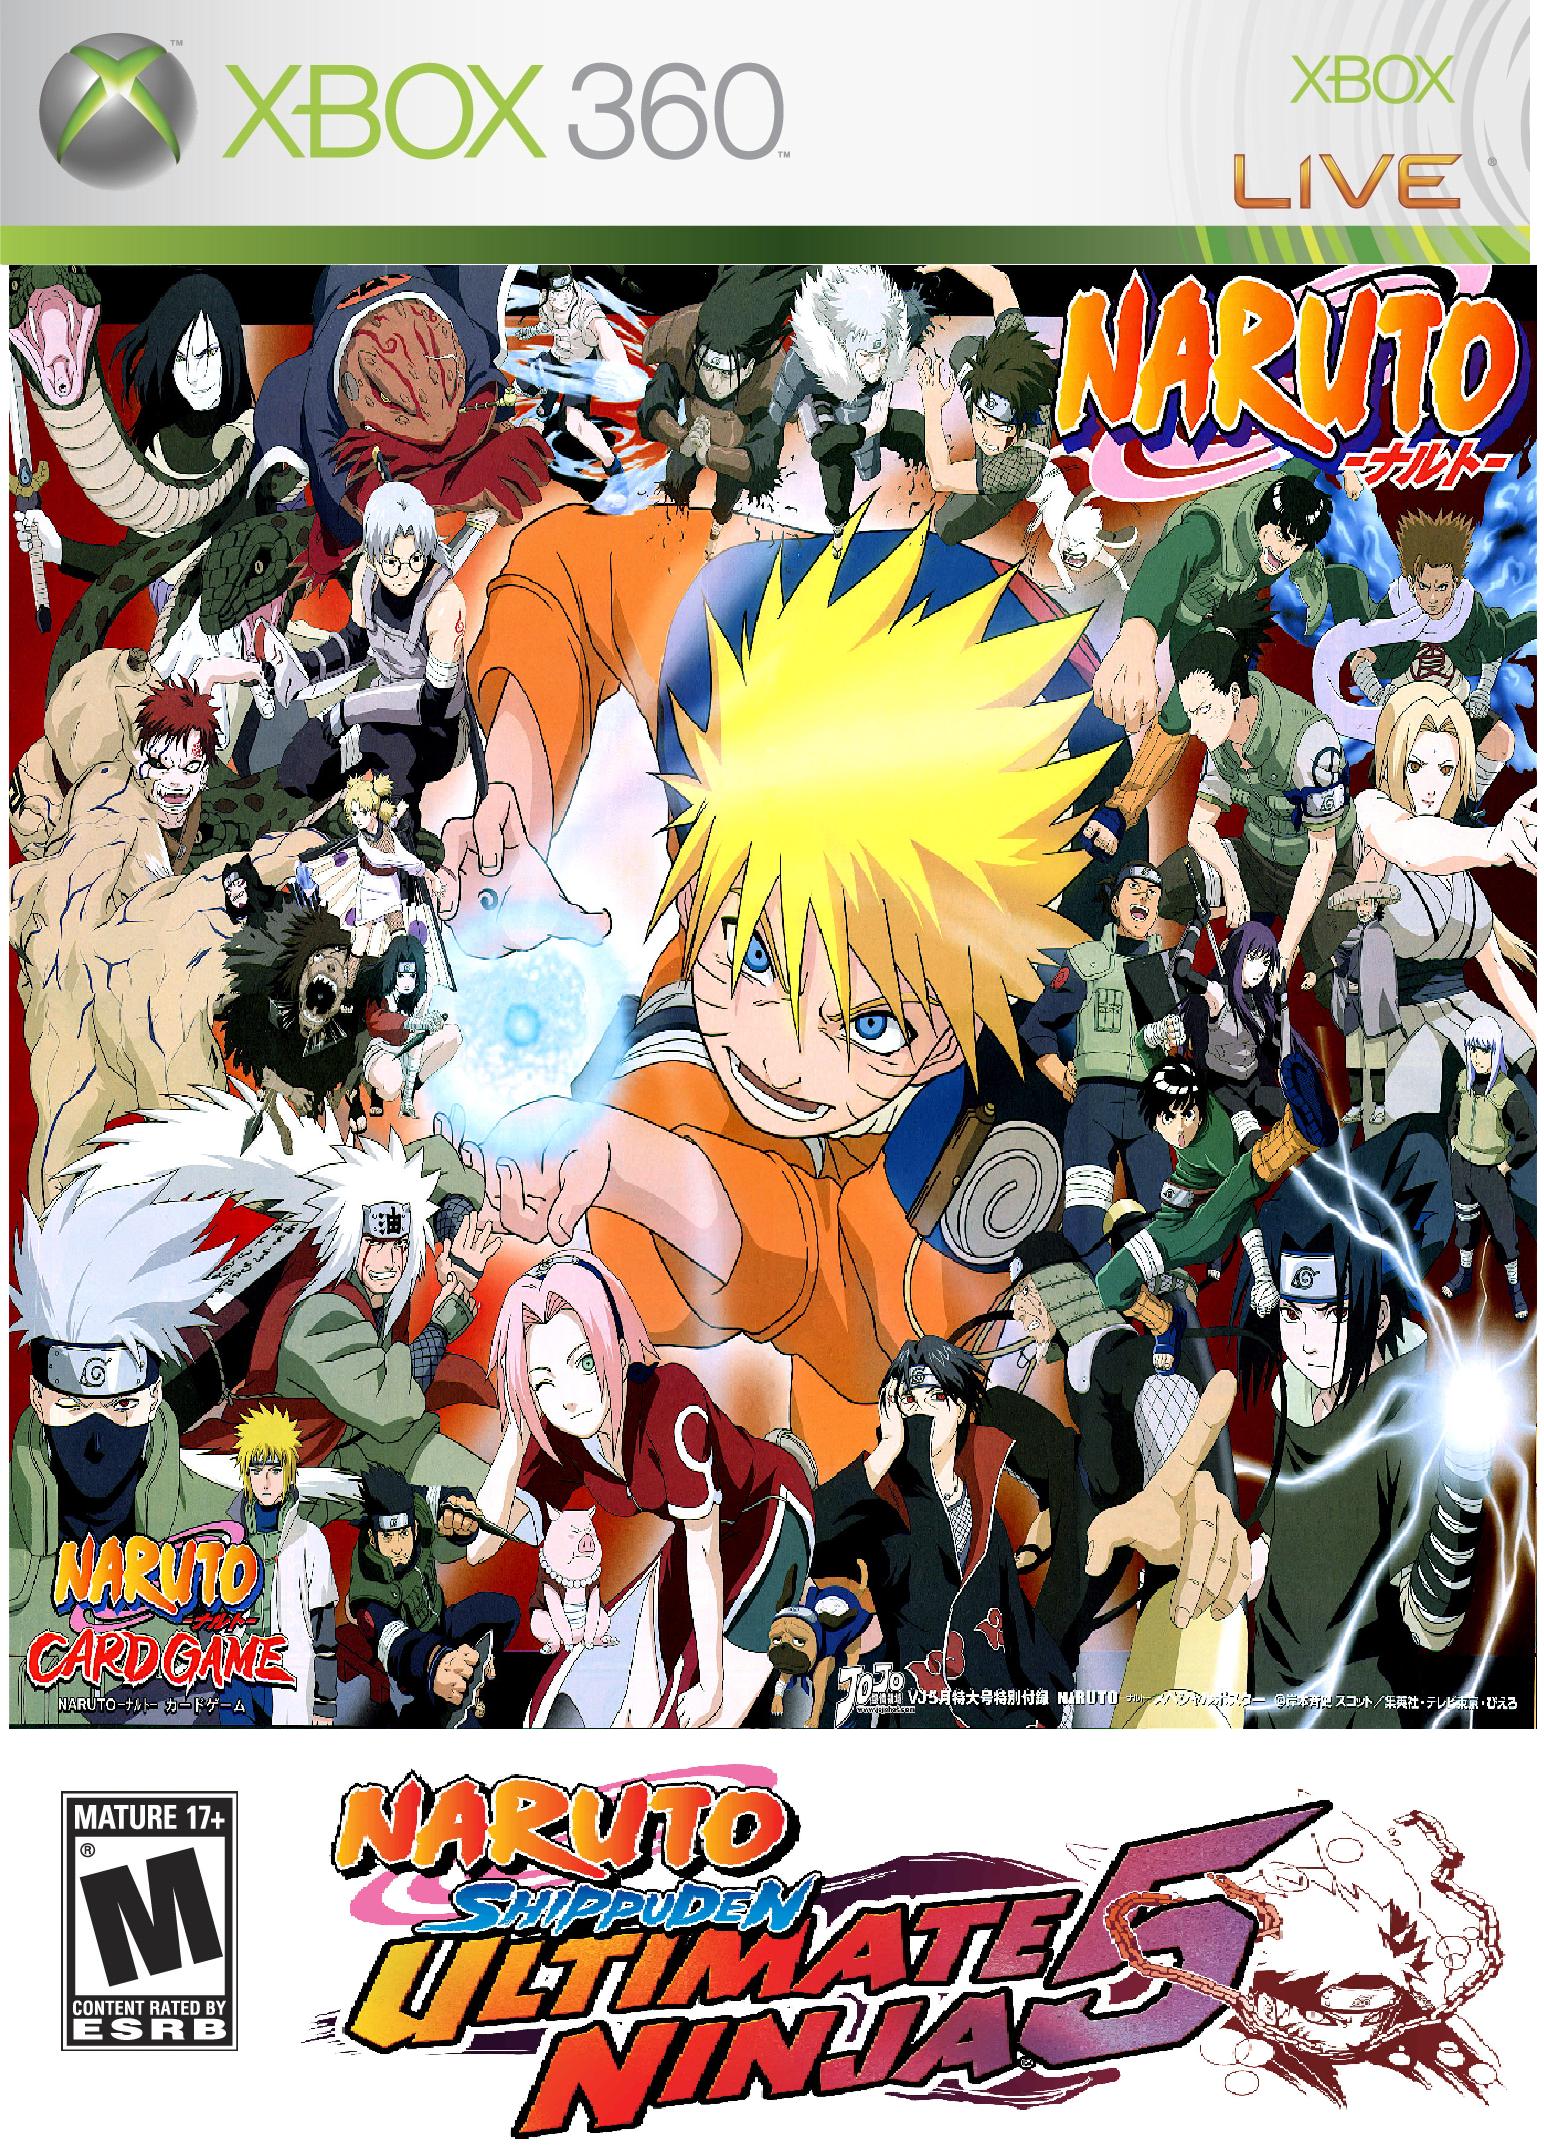 Naruto Shippuuden Ultimate Ninja 5 Xbox 360 Cover by puja39